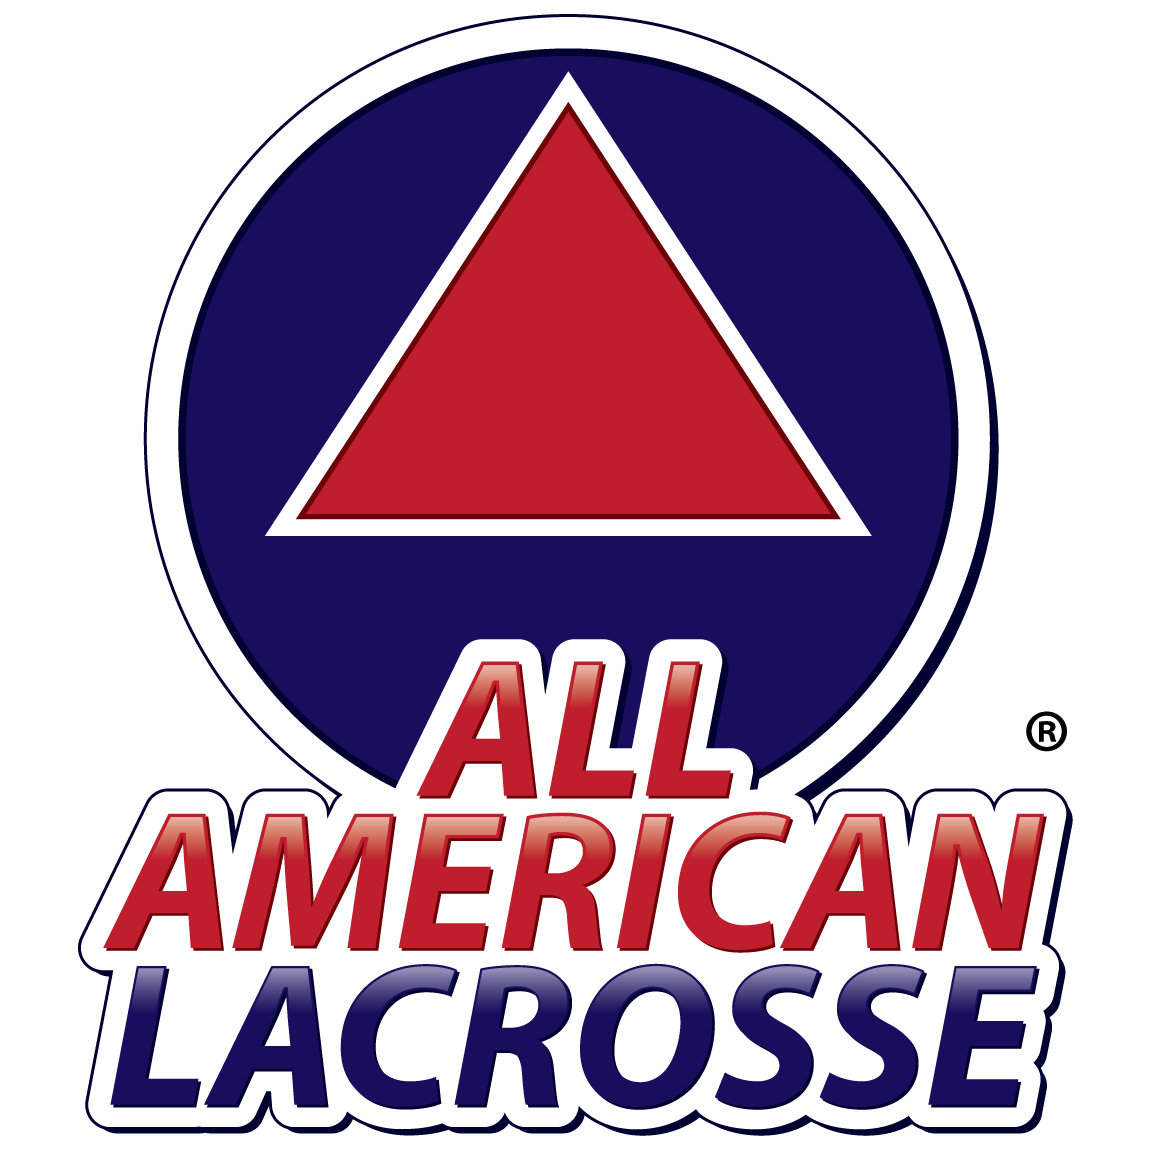 All American Lacrosse